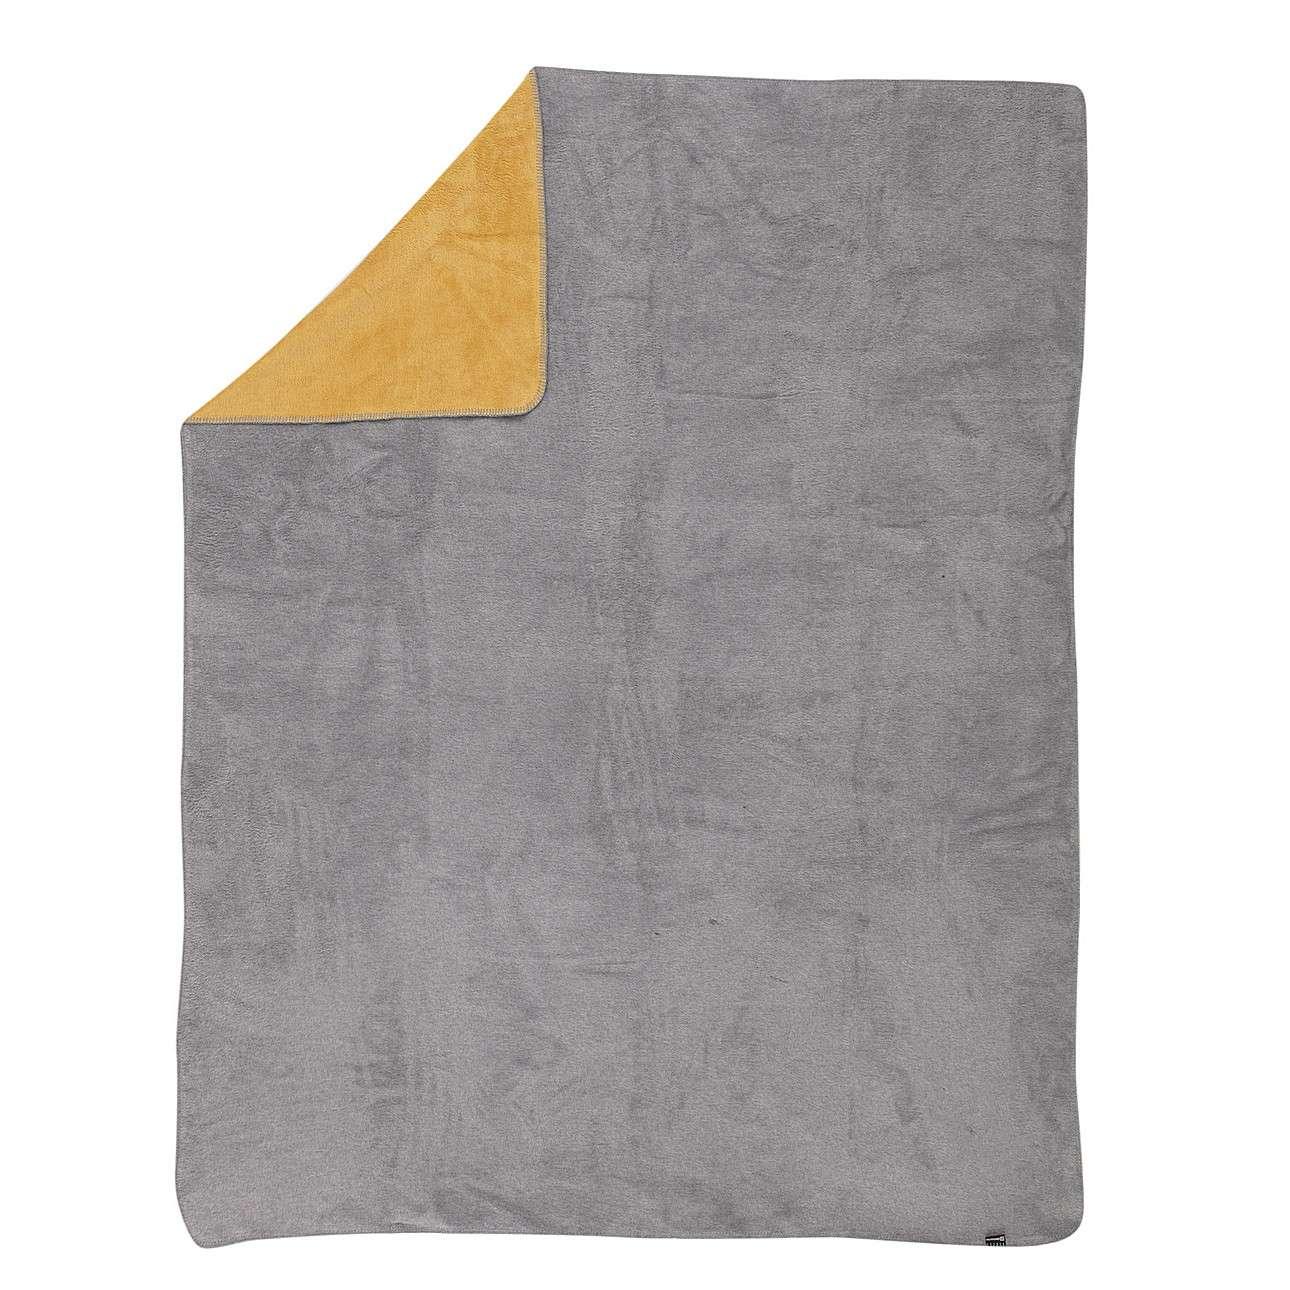 Koc Cotton Cloud 150x200cm  Mustard&Grey